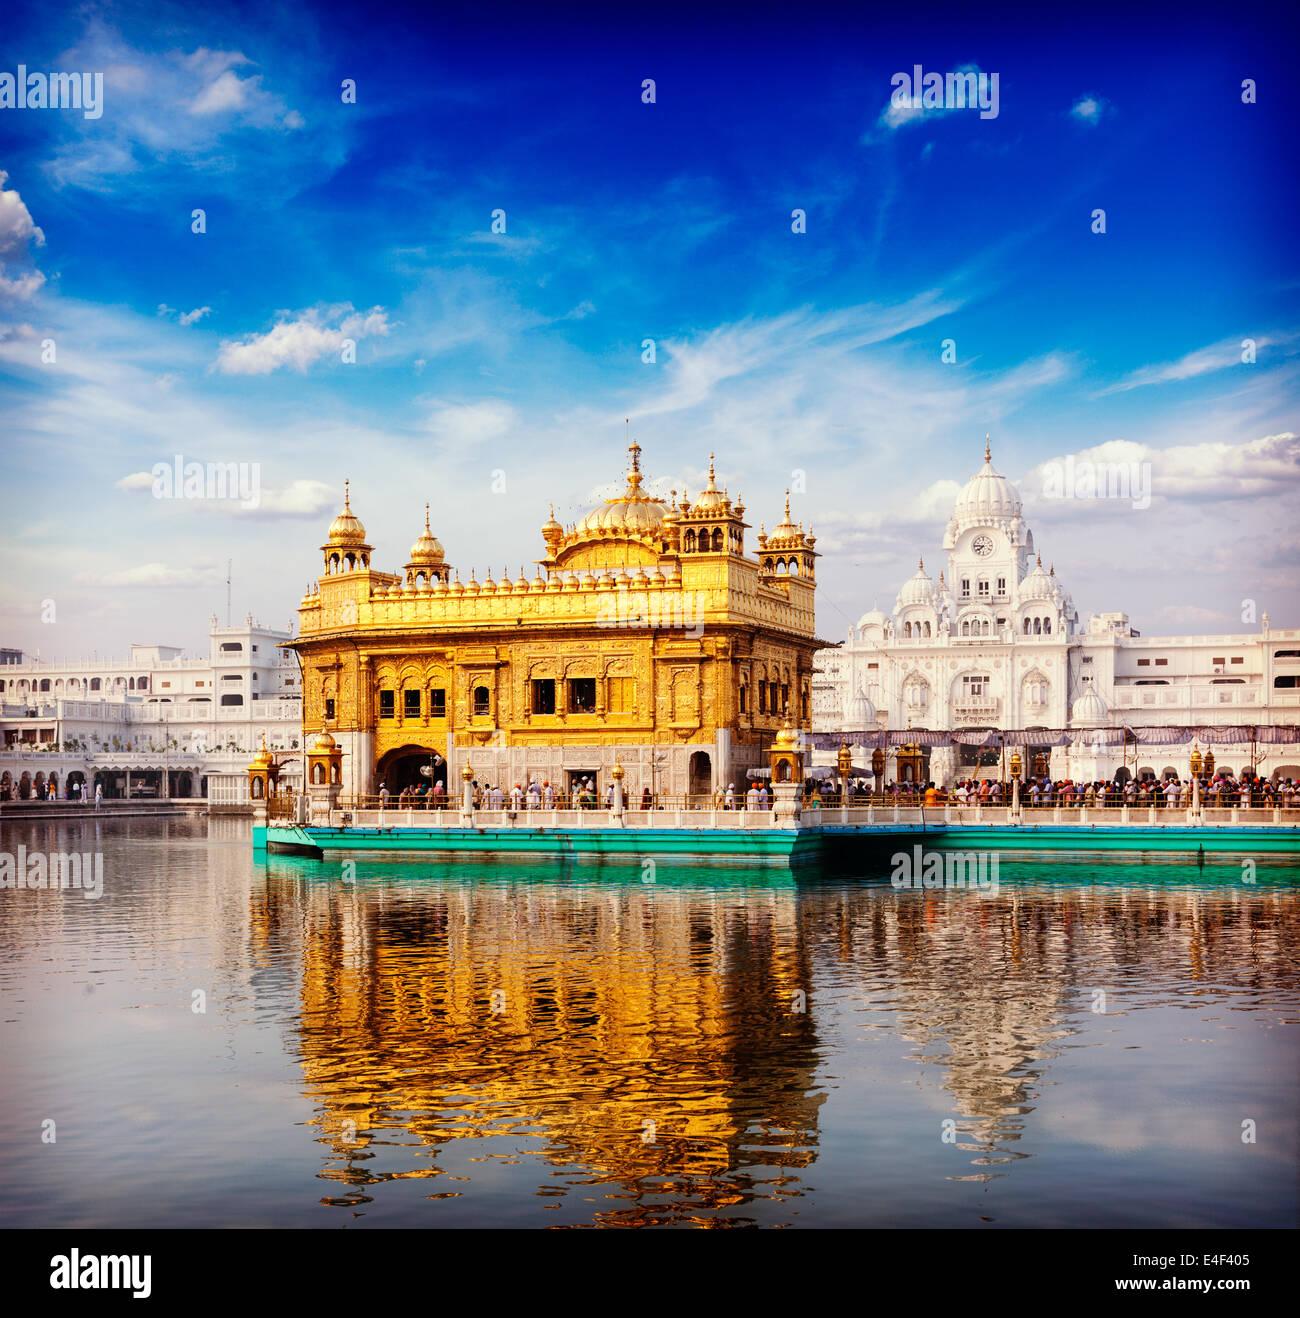 Vintage Retro-Hipster Stil reisen Bild des berühmten Indien Attraktion Sikh Gurdwara Golden Temple (Harmandir Stockbild